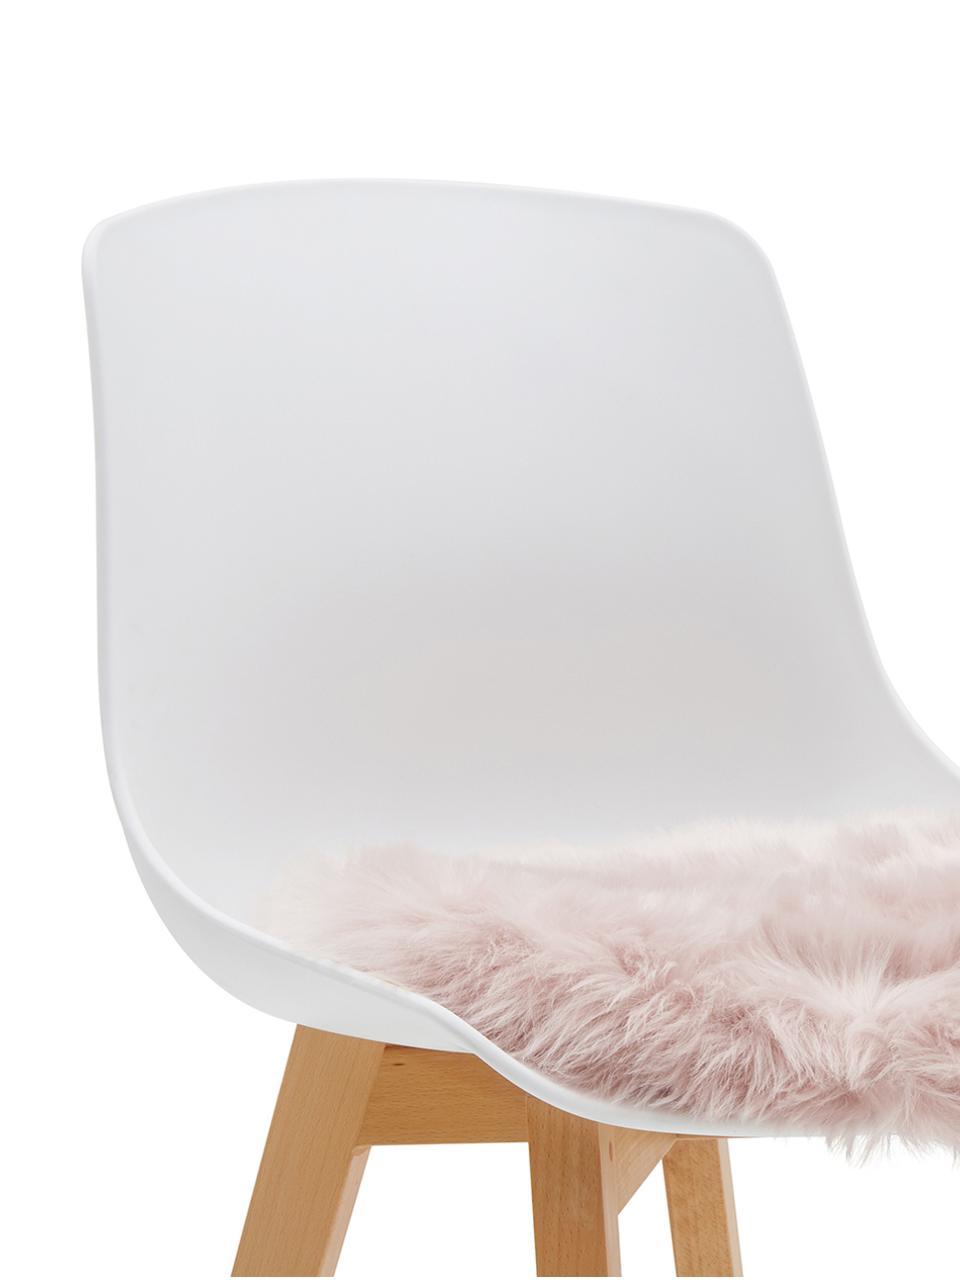 Runde Kunstfell-Sitzauflage Mathilde, glatt, Vorderseite: 65% Akryl, 35% Polyester, Rückseite: 100% Polyester, Rosa, Ø 37 cm